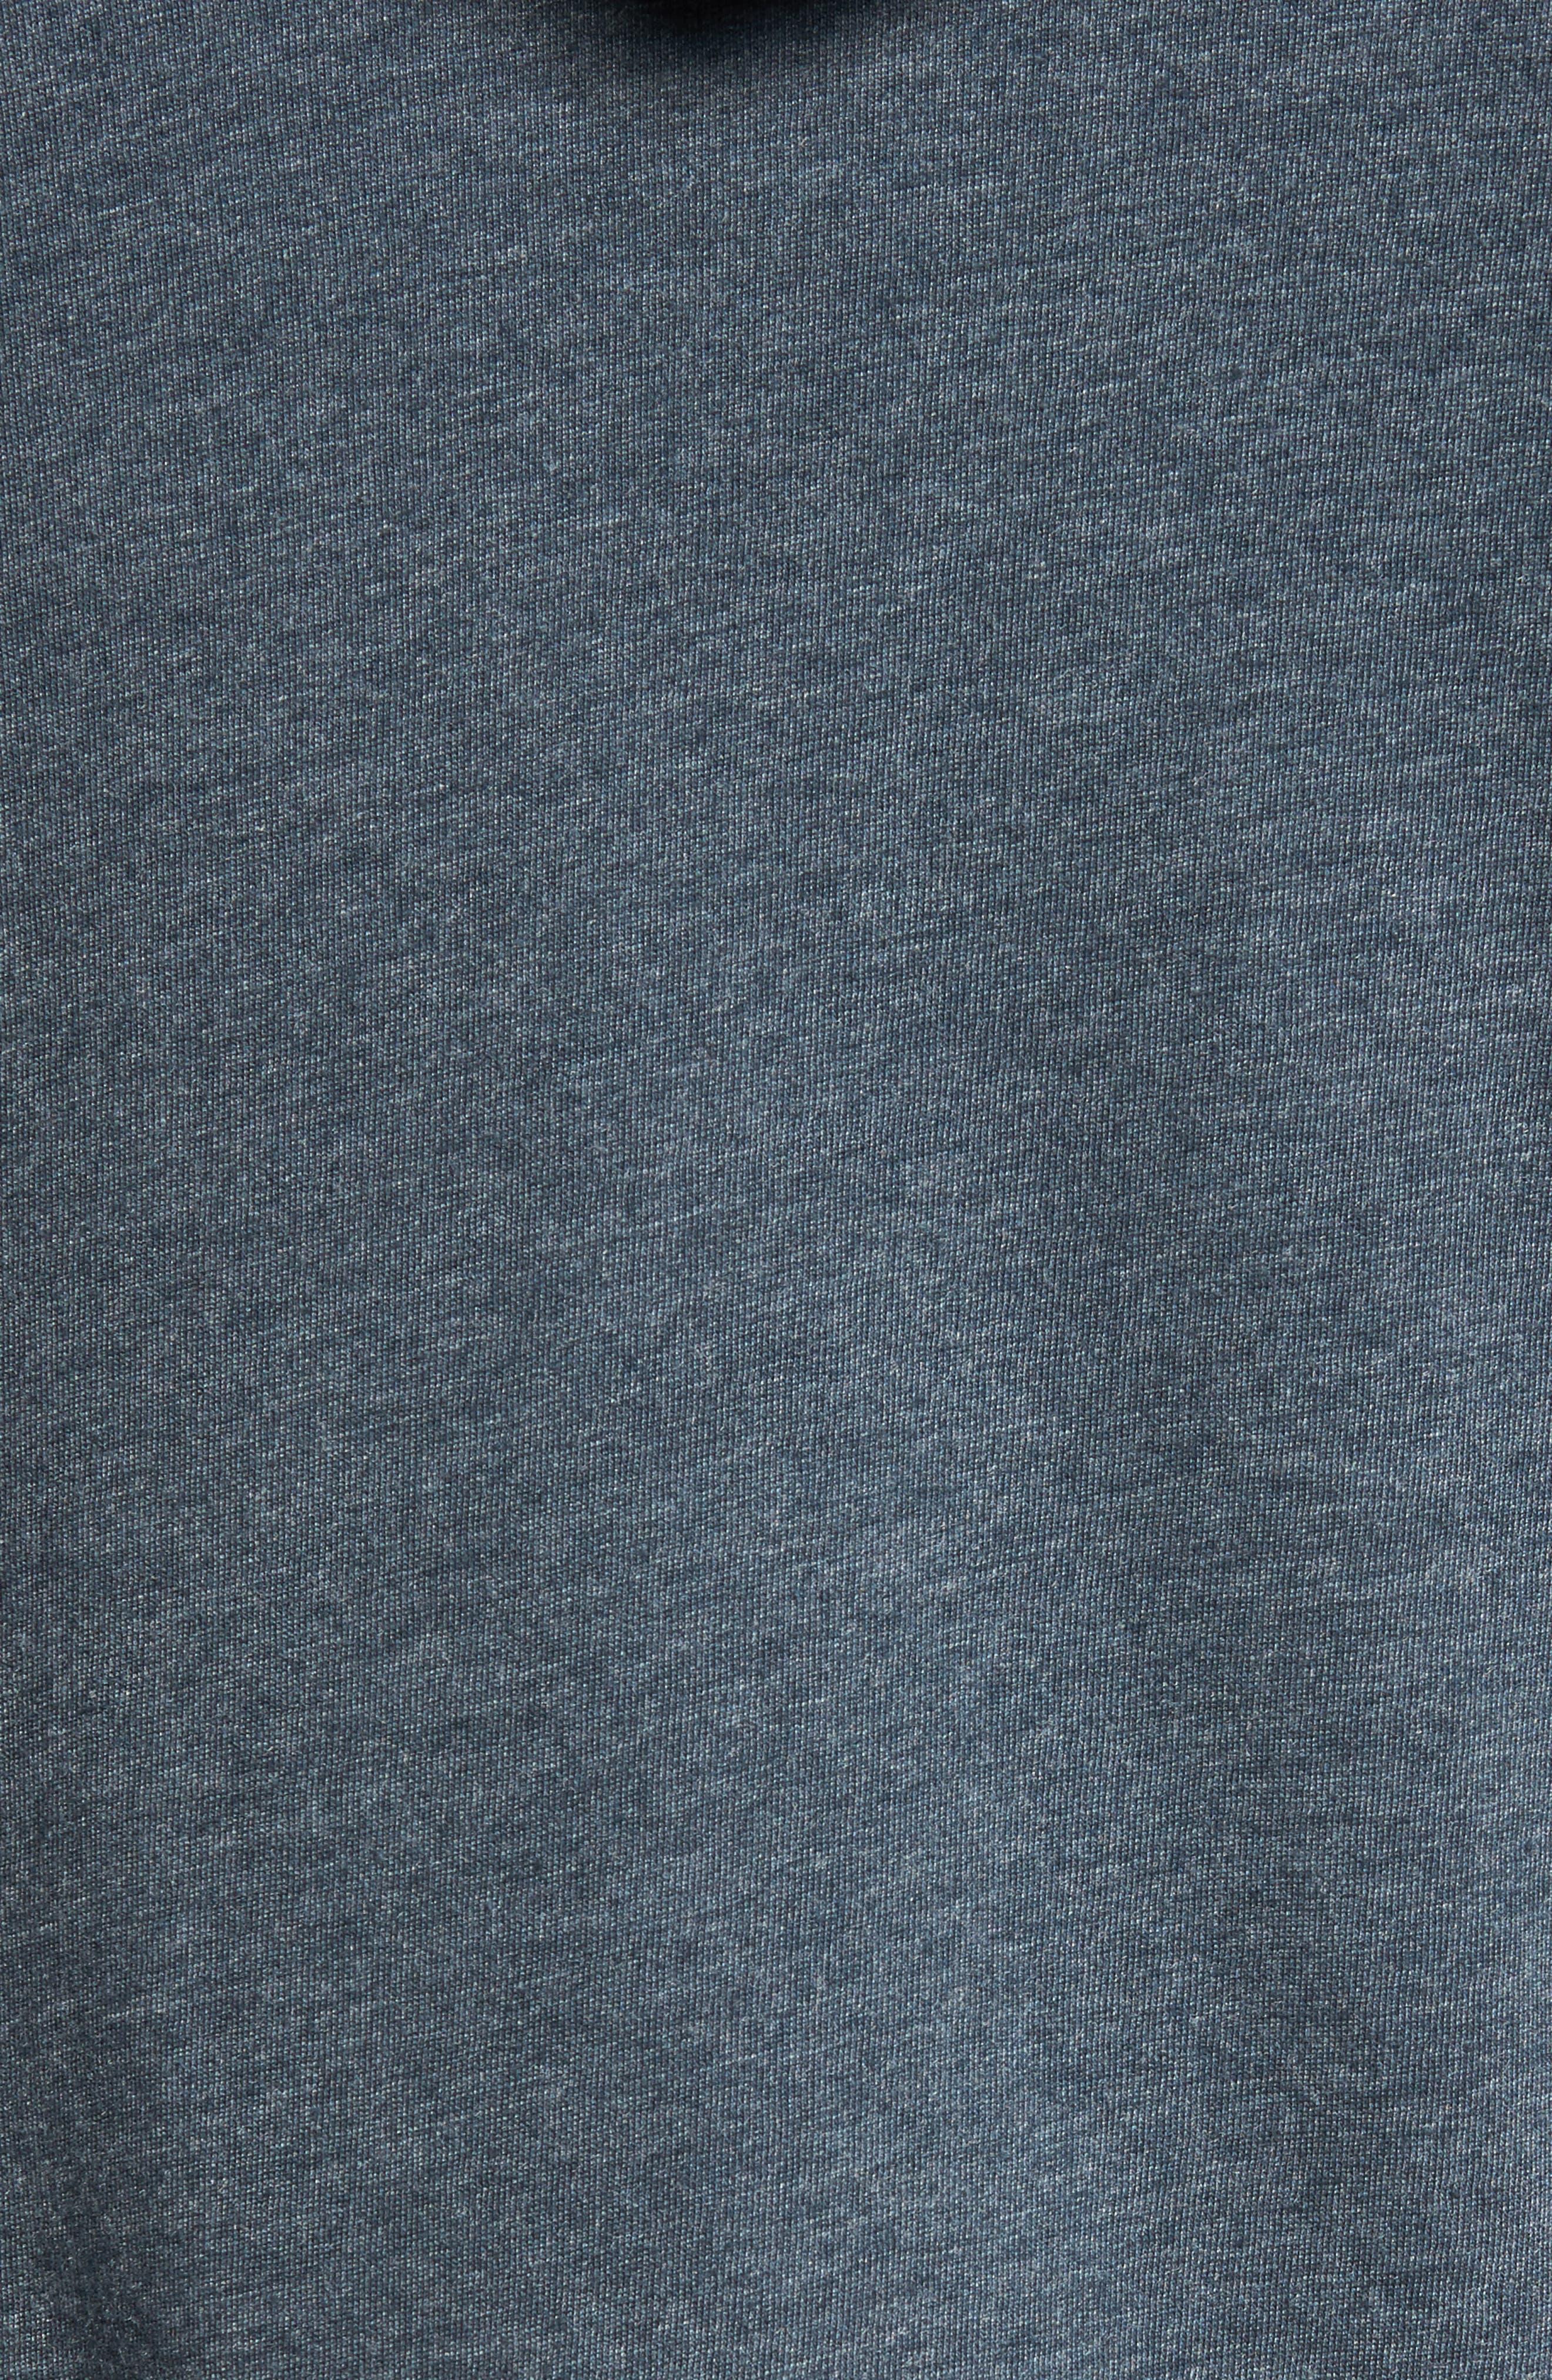 Reversible Hooded Jersey T-Shirt,                             Alternate thumbnail 17, color,